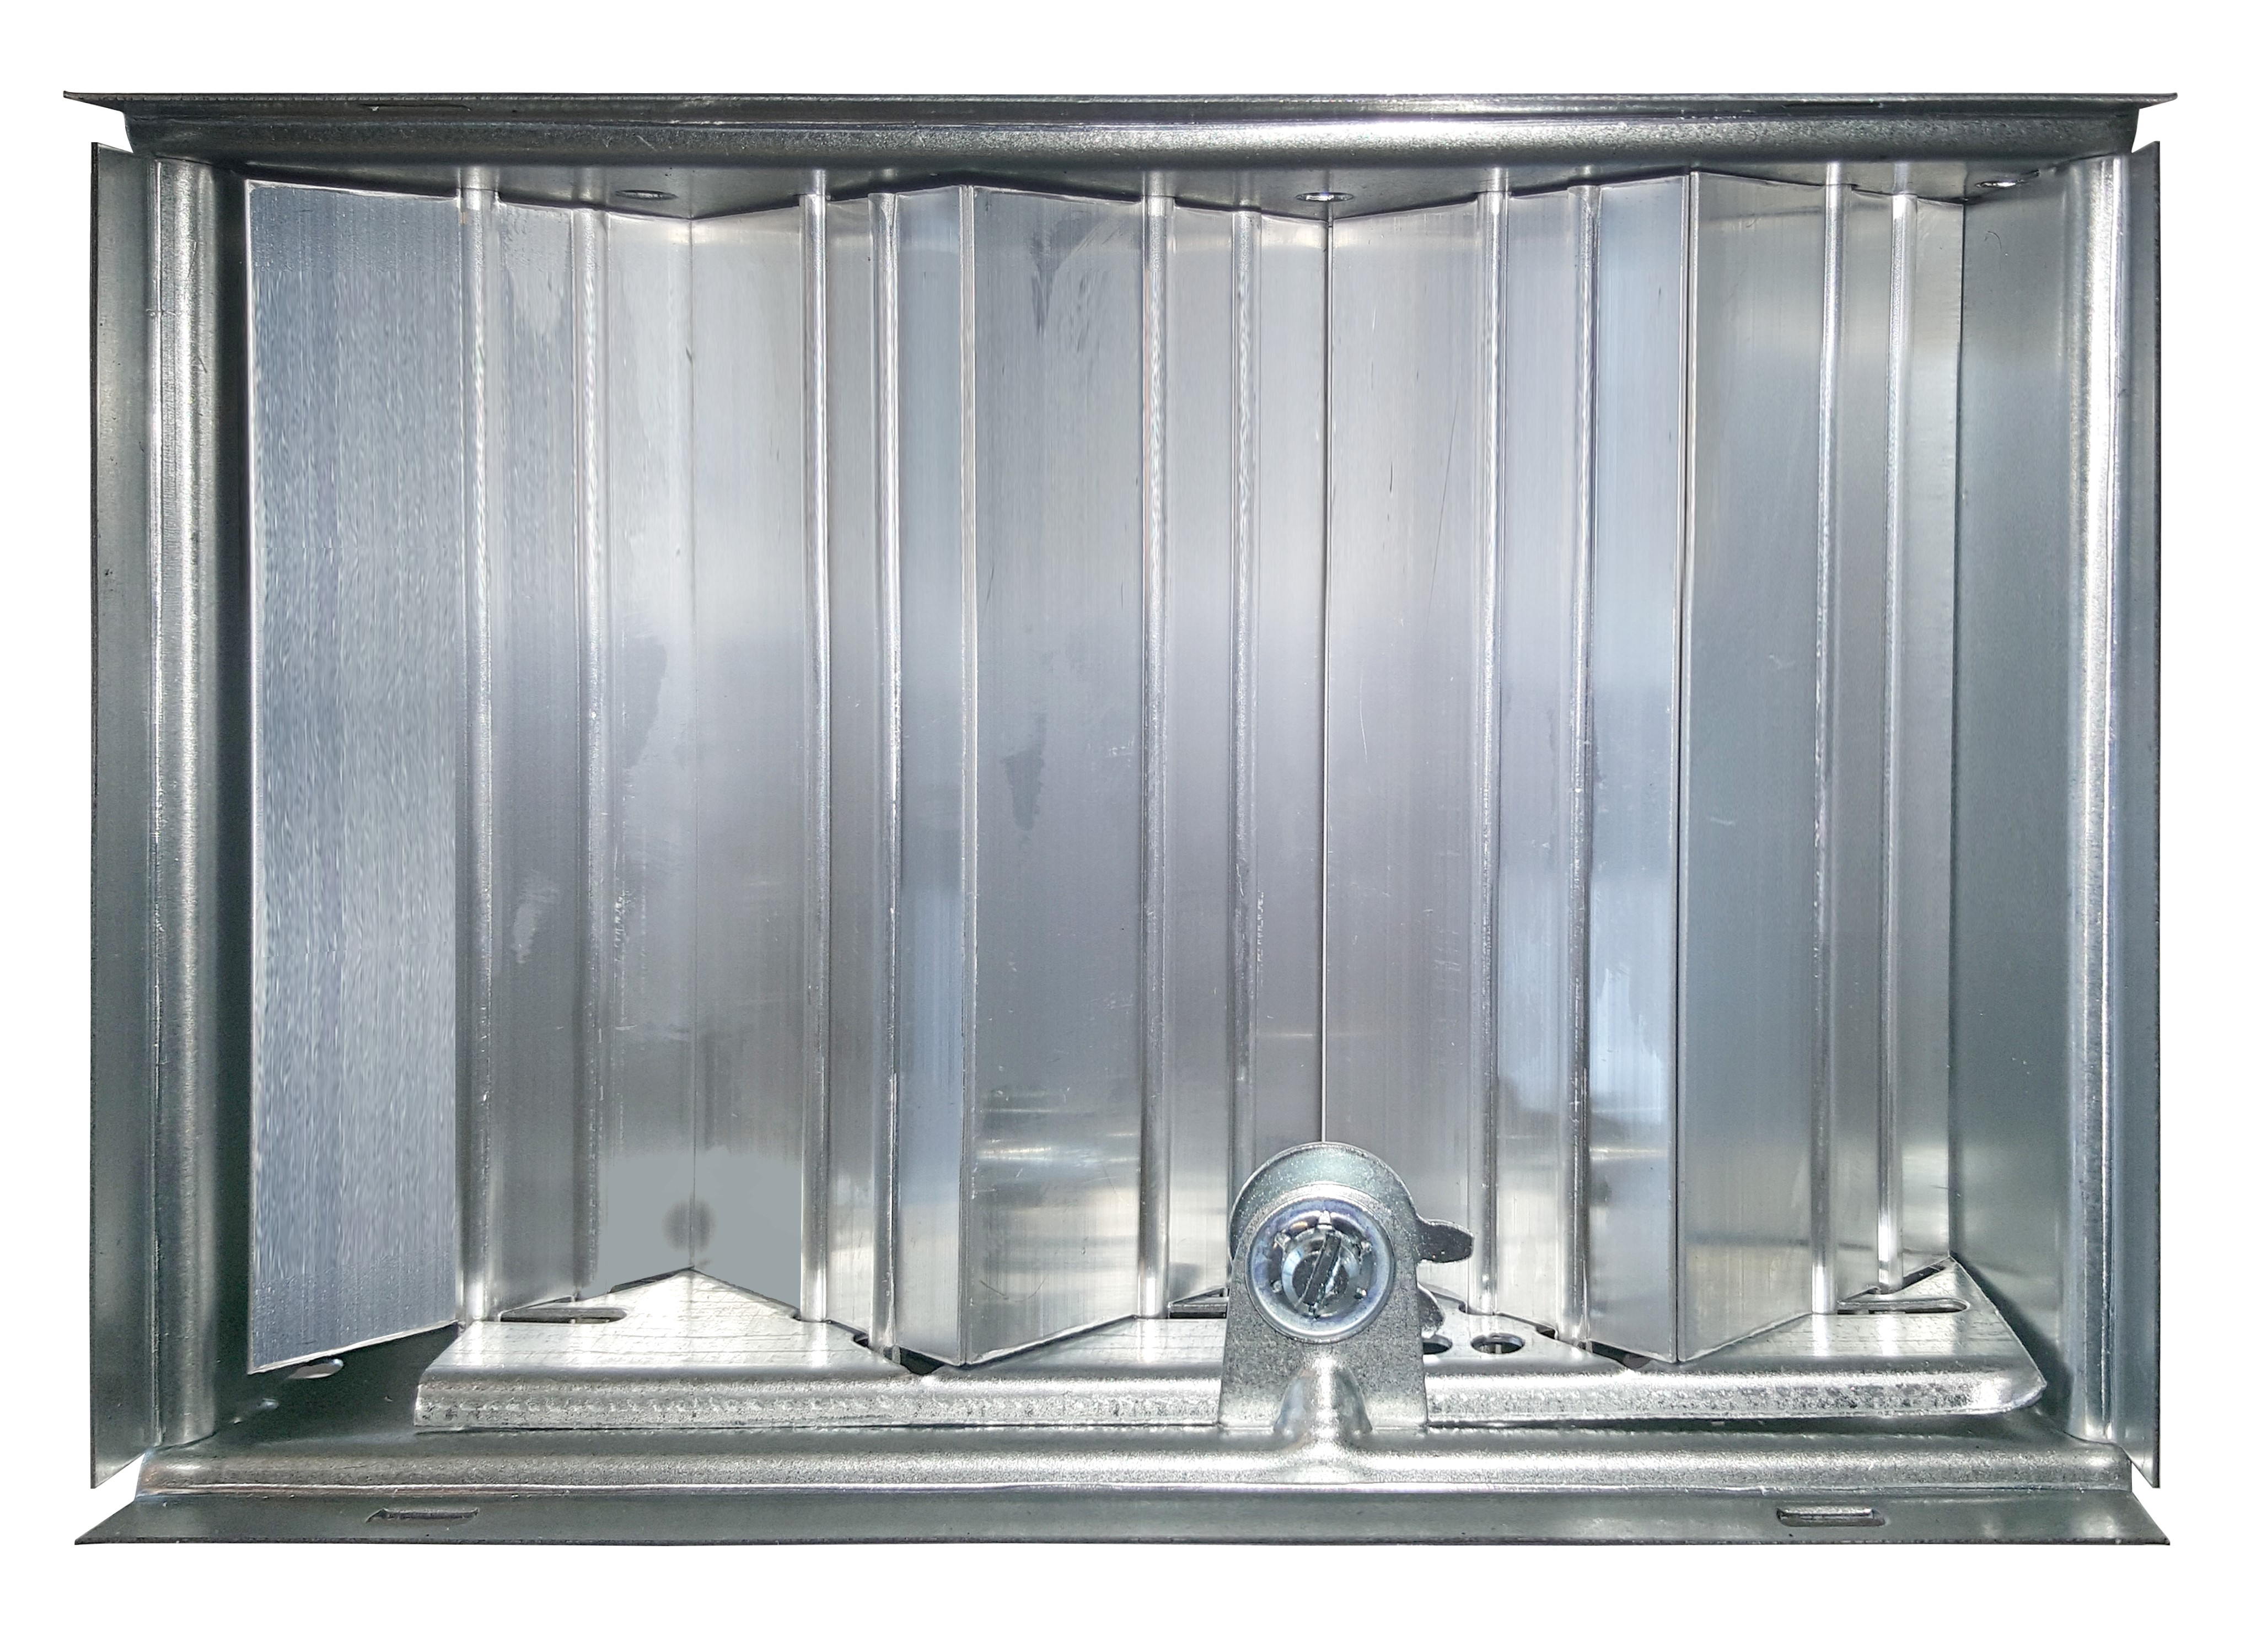 Serranda di regolazione a contrasto per bocchette dimensione 1000x300 mm serie BBMA/BGRA